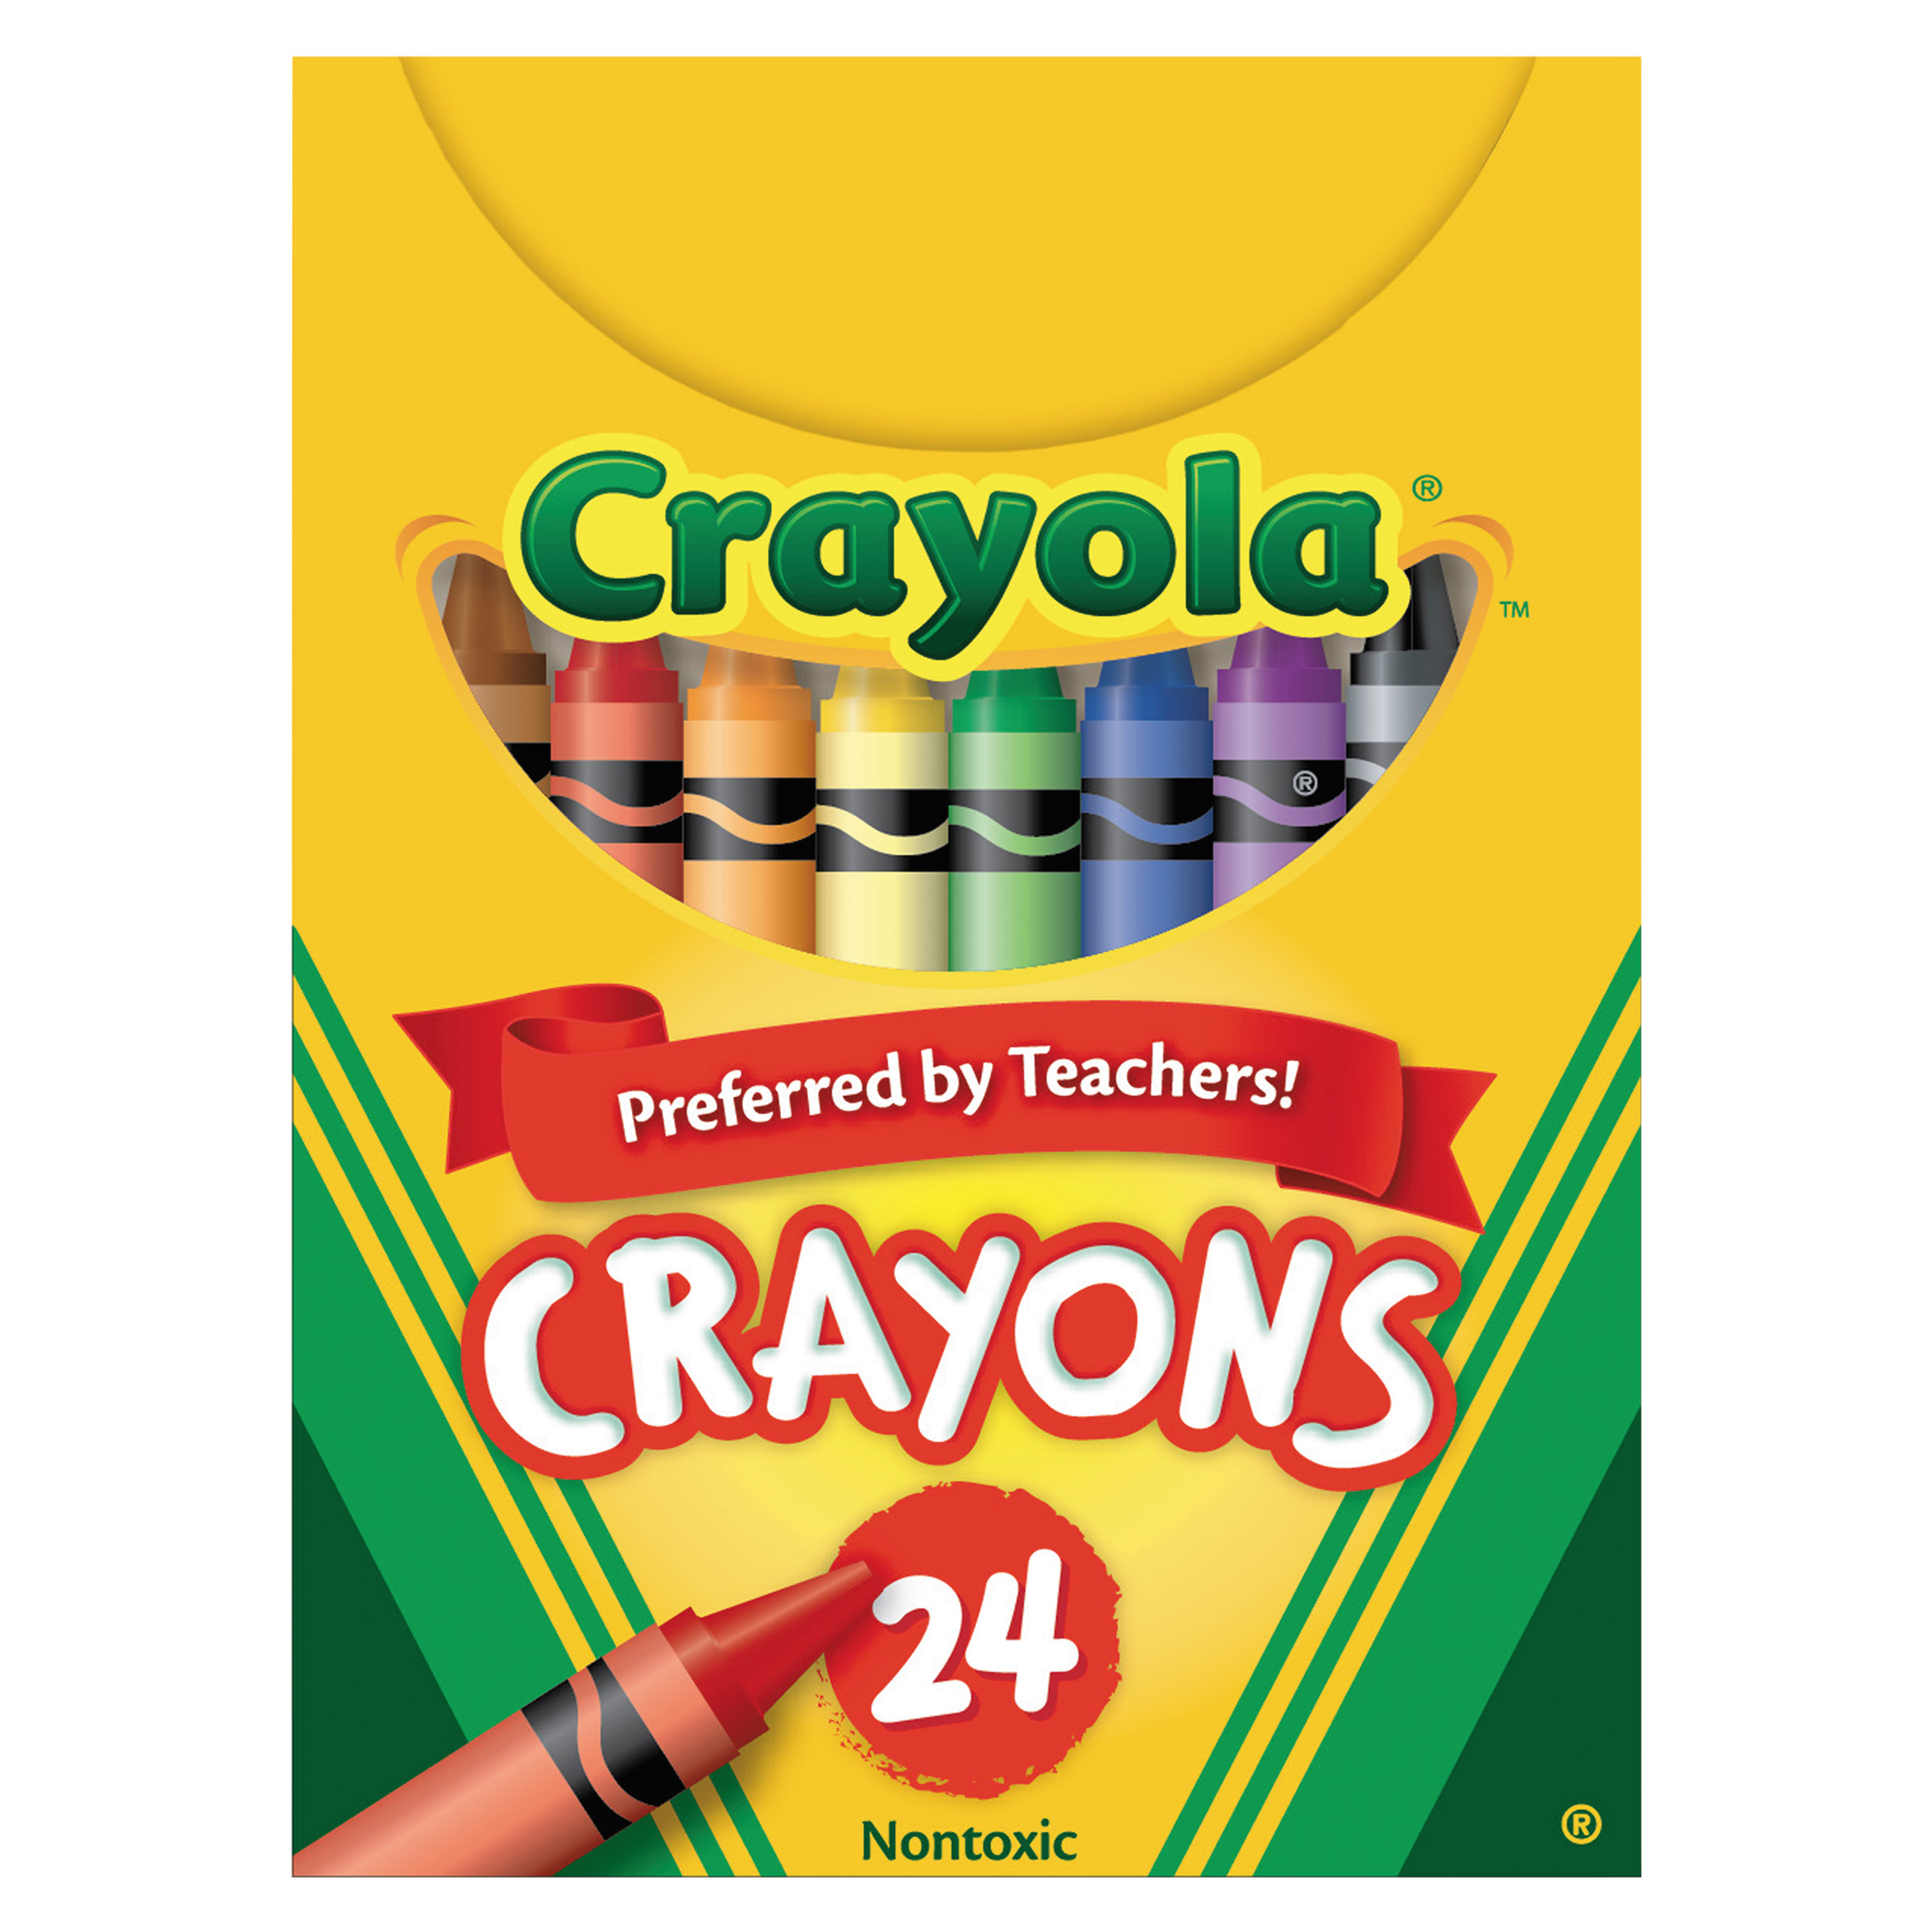 Crayola Crayon Set 24 Assorted Colors